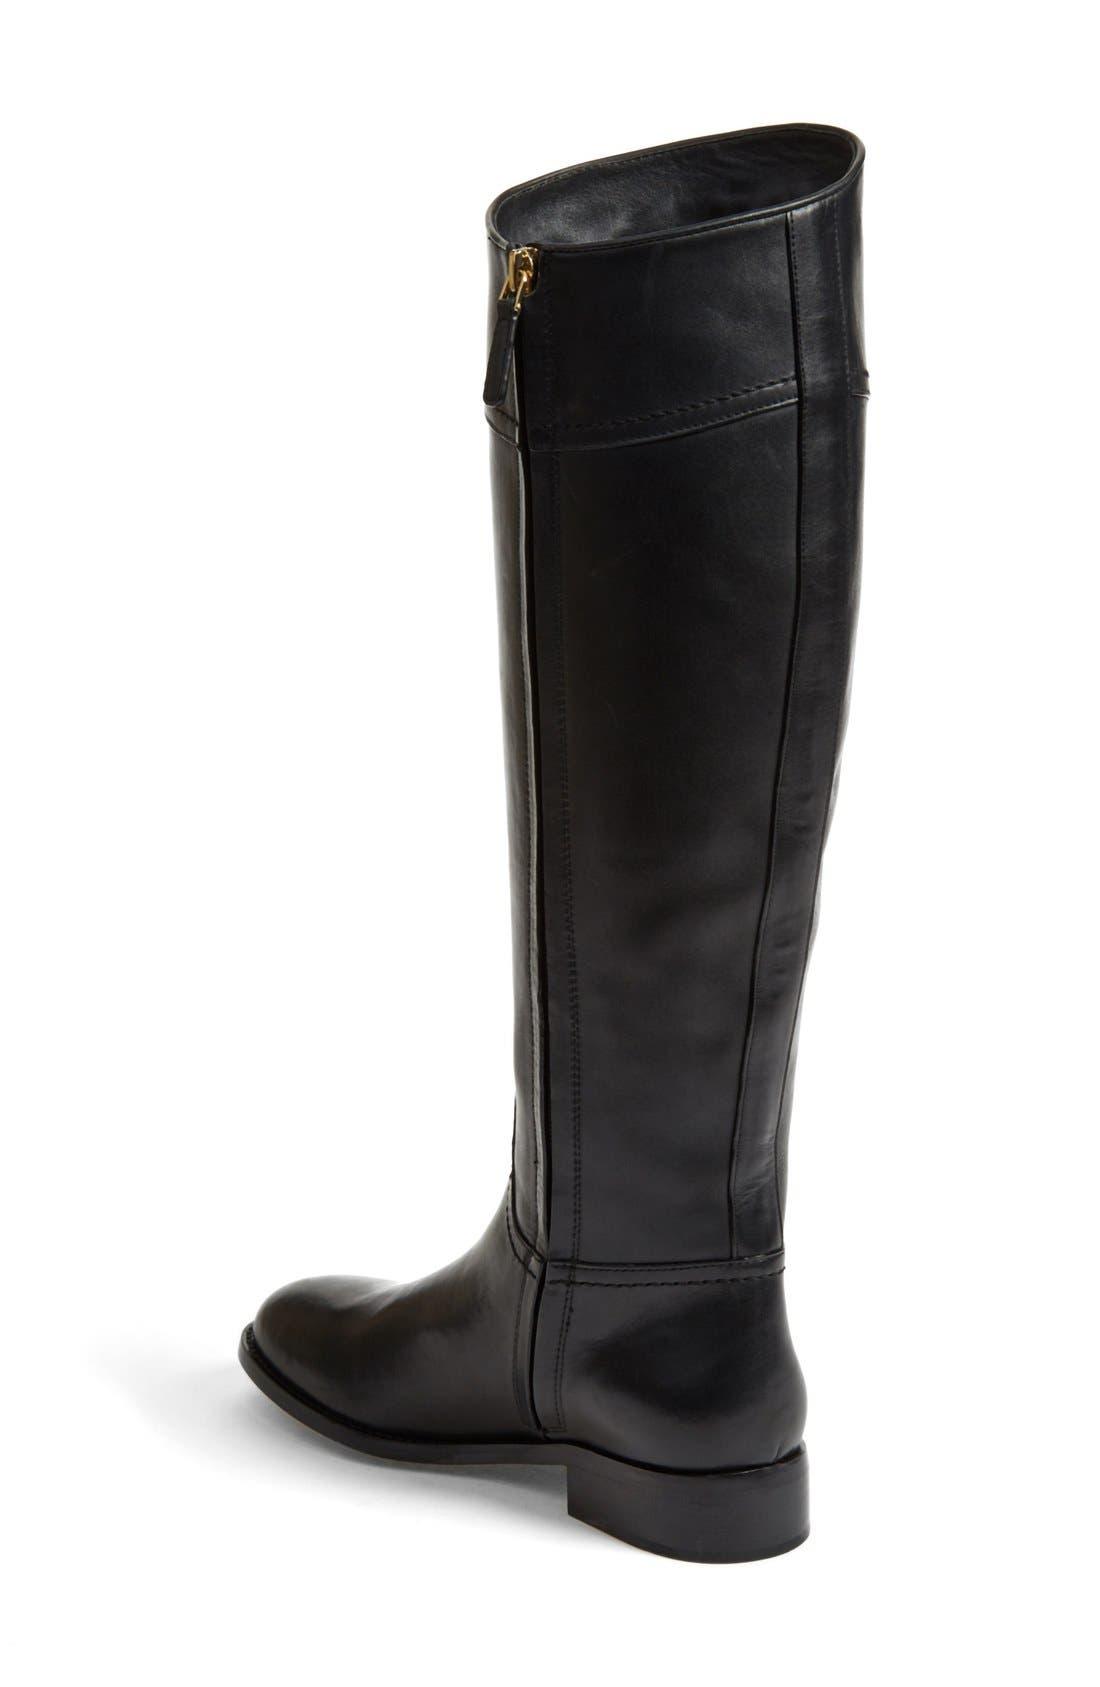 Alternate Image 2  - Tory Burch 'Ashlynn' Riding Boot (Women) (Nordstrom Exclusive)